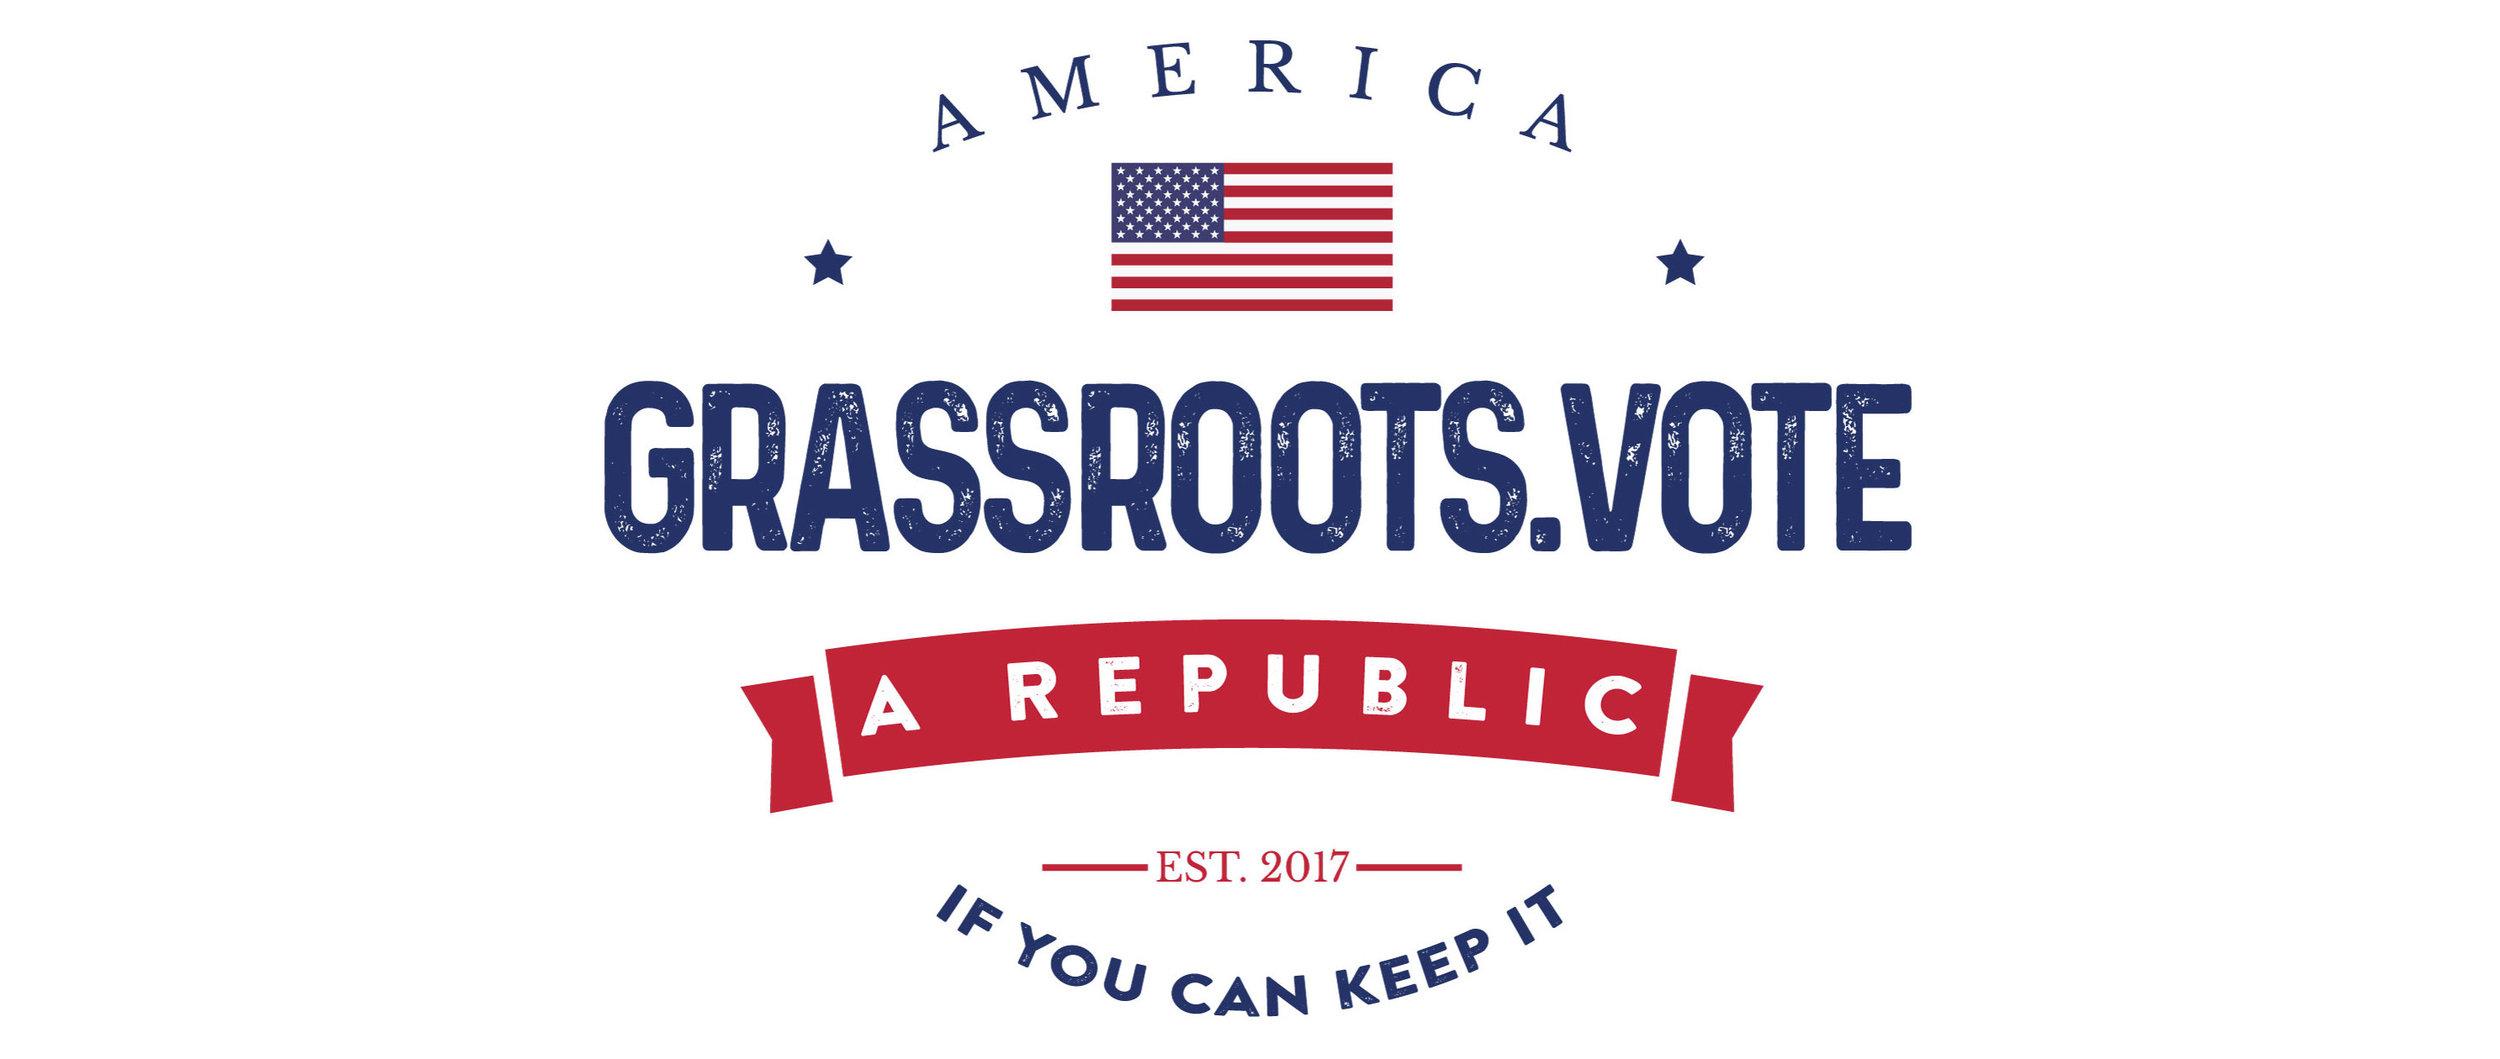 Grassroots-Vote - Jason W Hoyt - Logo-wide copy.jpeg